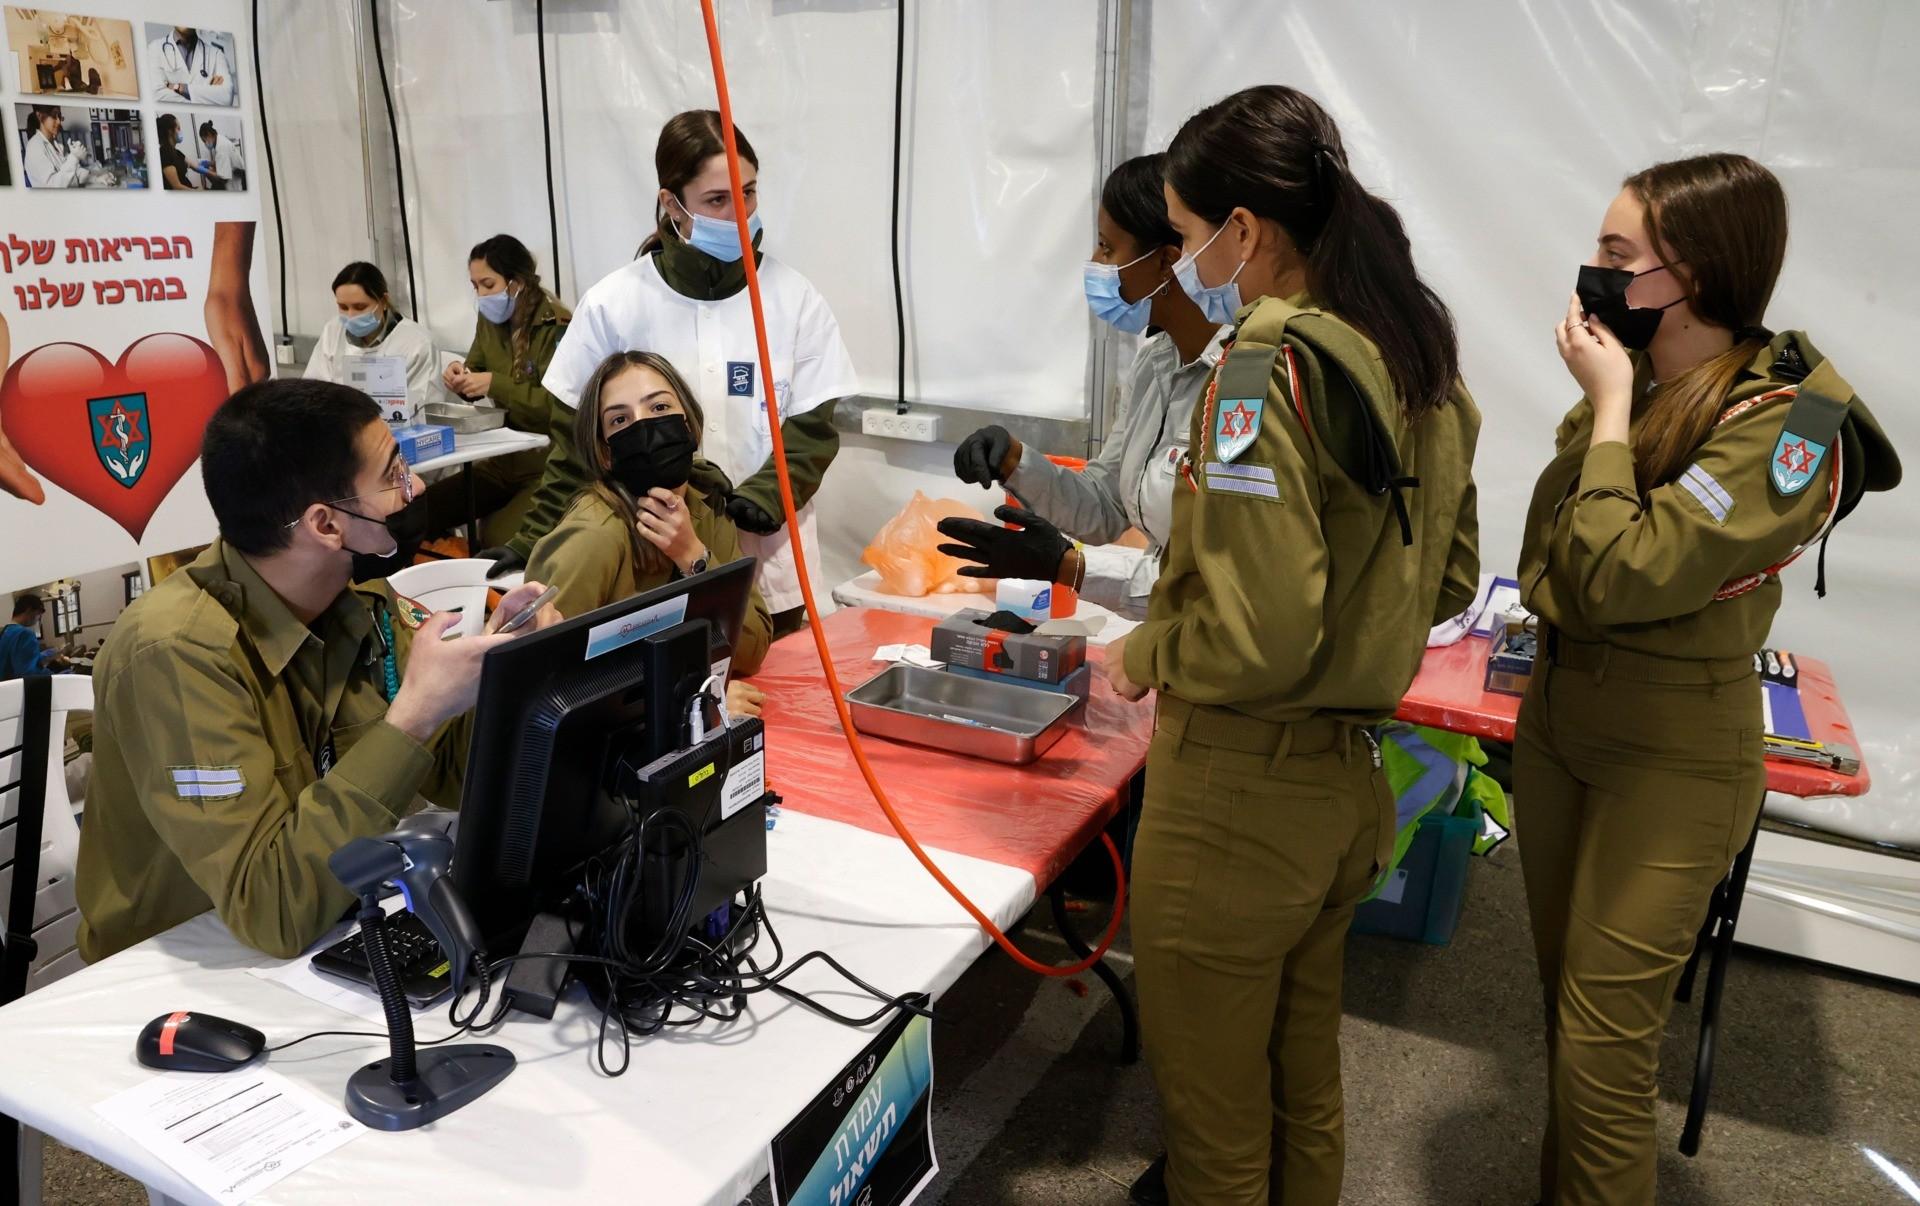 Israel imposes third nationwide COVID-19 lockdown amid vaccination drive